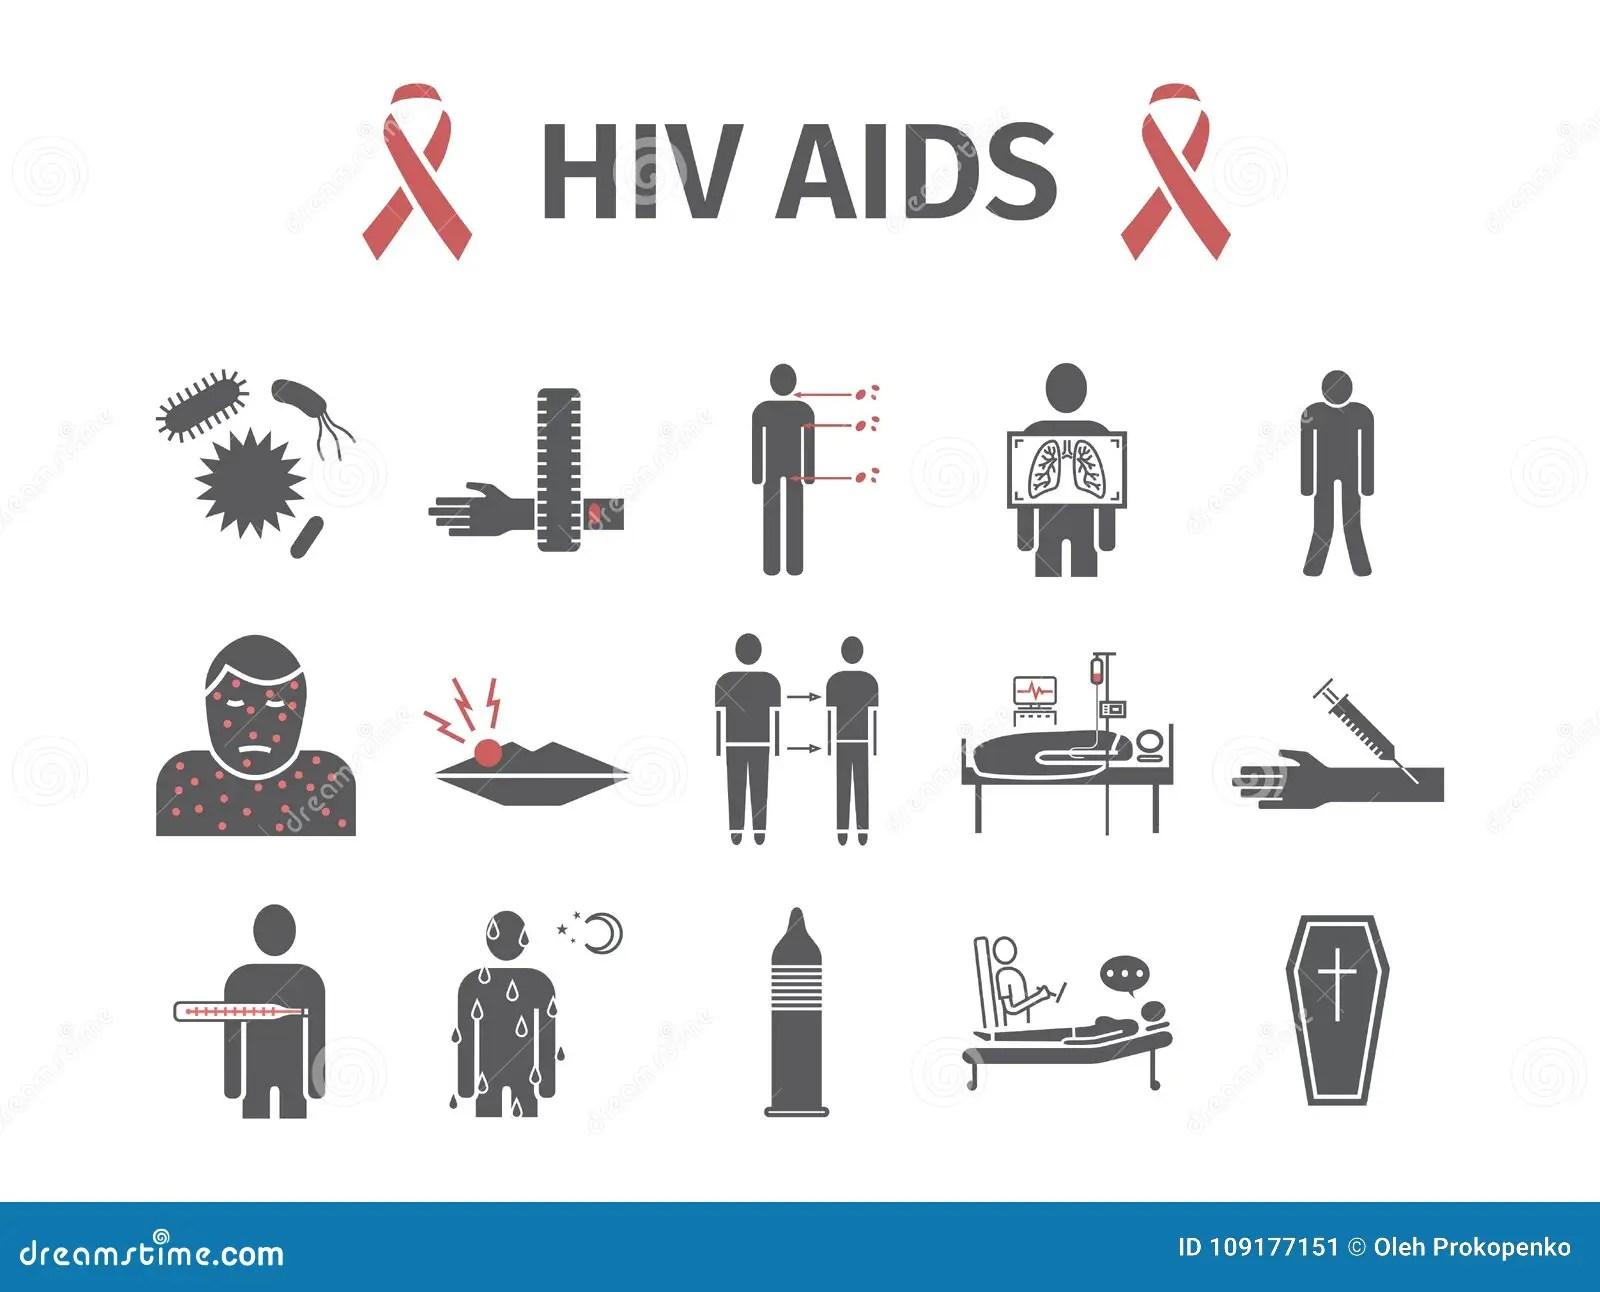 Hiv Aids Symptoms Treatment Flat Icons Set Vector